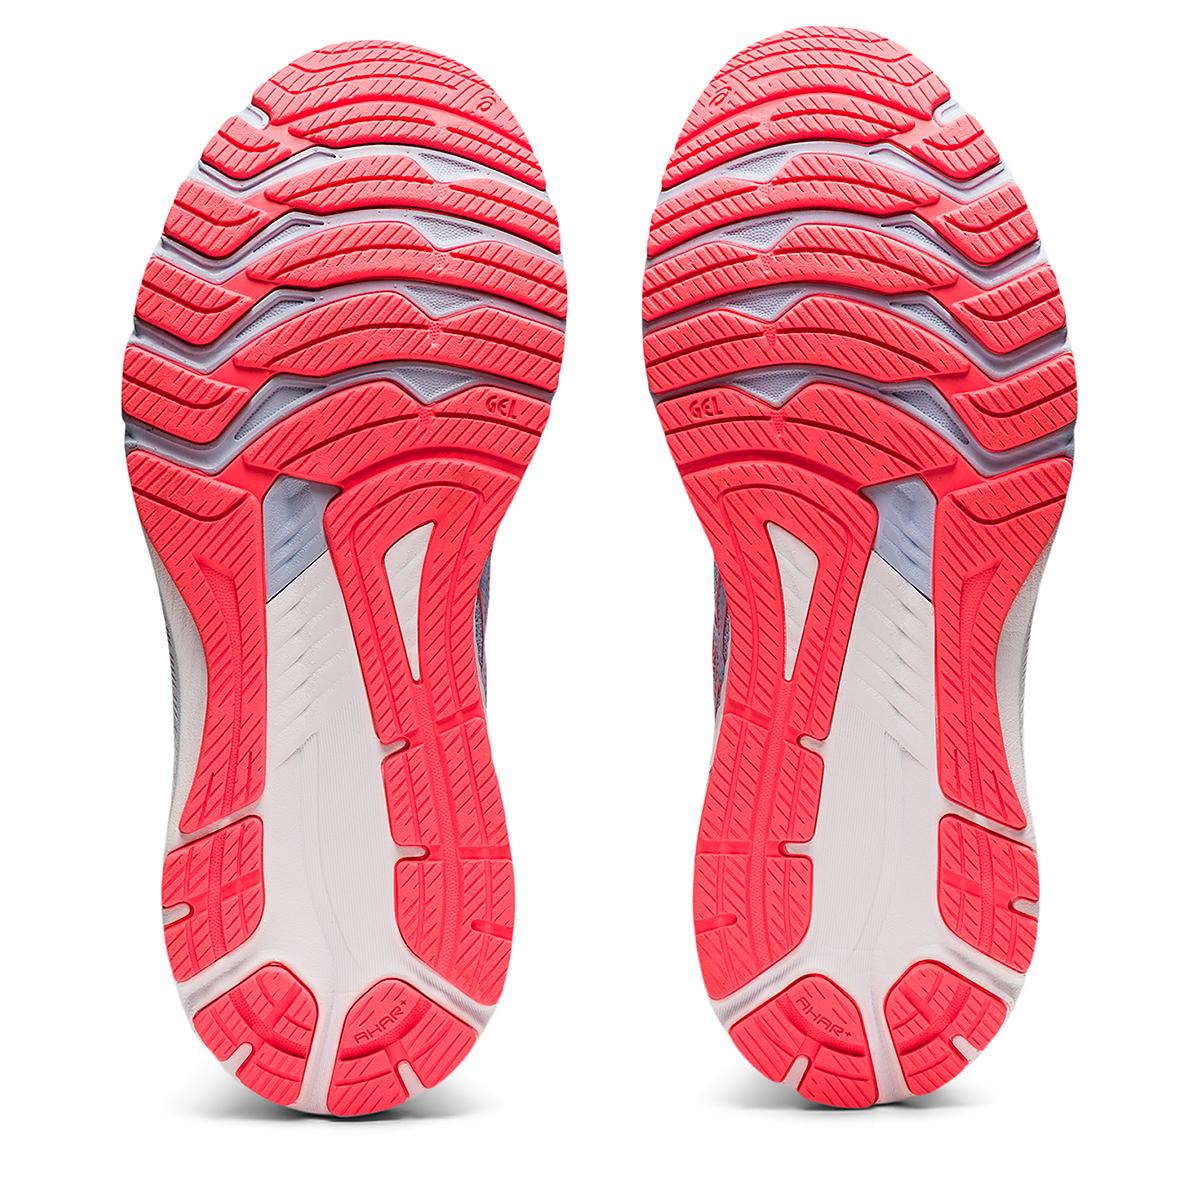 Women's Asics GT-2000 10 Running Shoe - Color: Mist/Blazing Coral - Size: 5 - Width: Regular, Mist/Blazing Coral, large, image 7